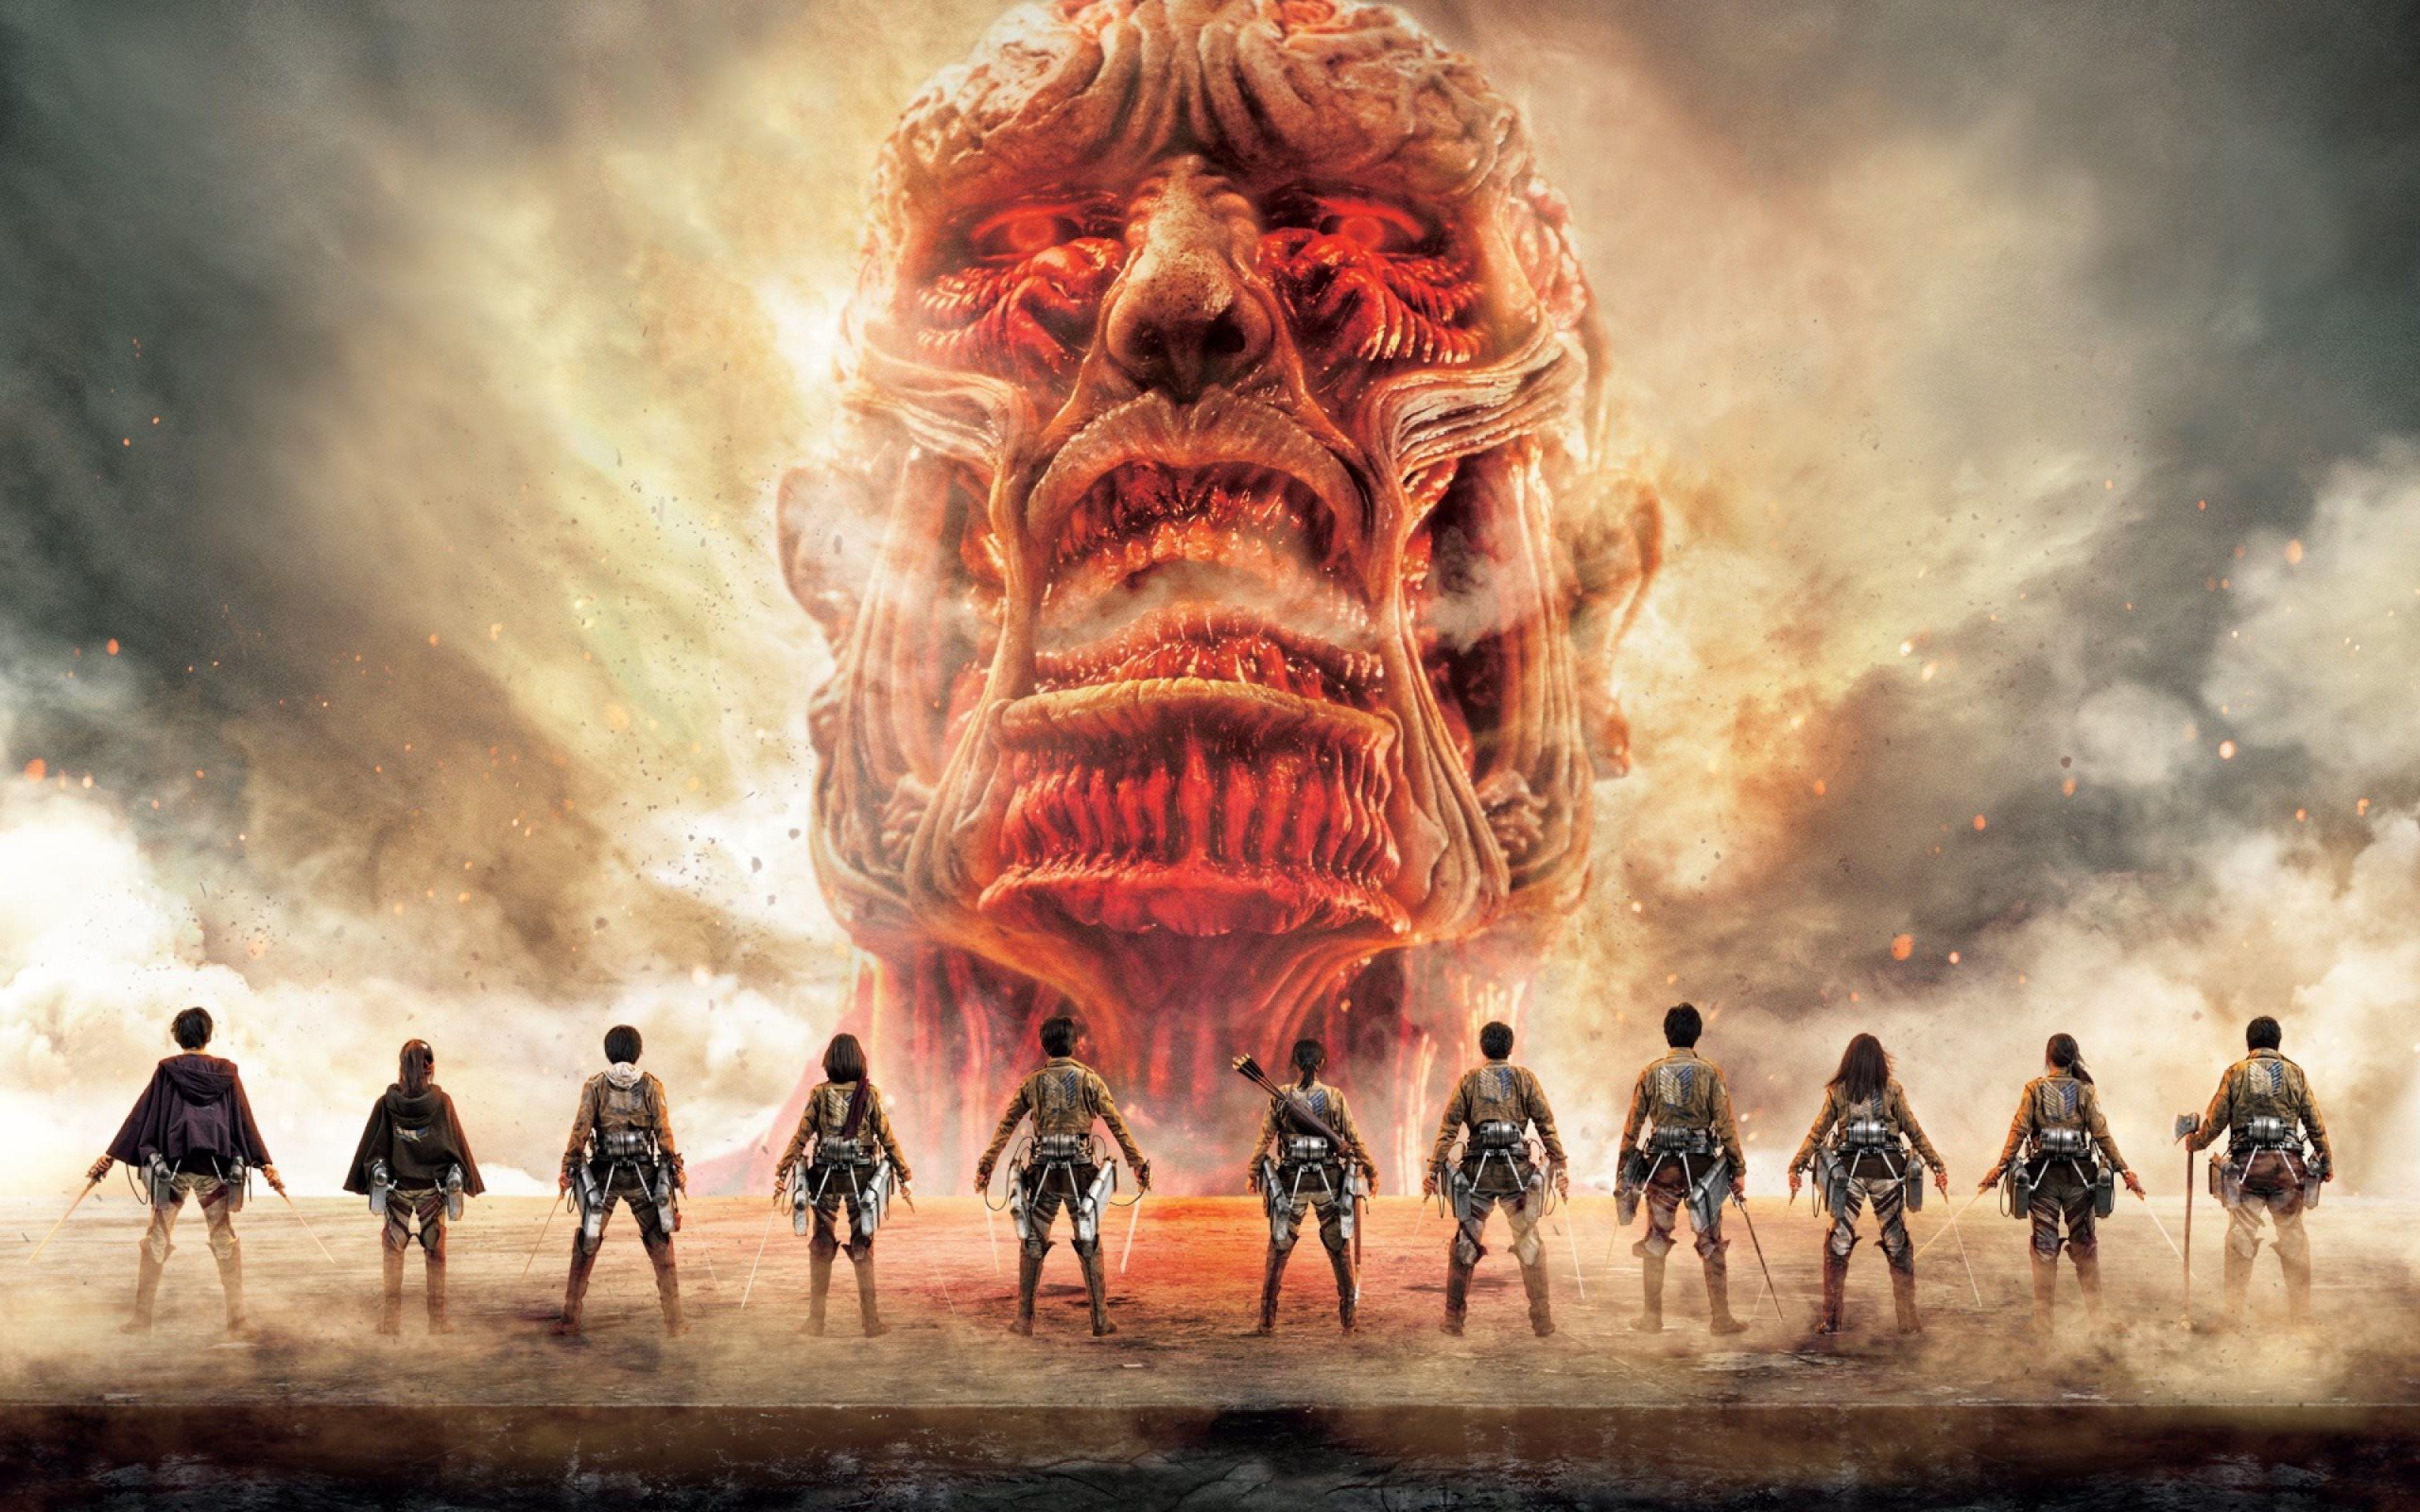 Attack On Titan Season 3 Wallpaper Posted By Samantha Tremblay